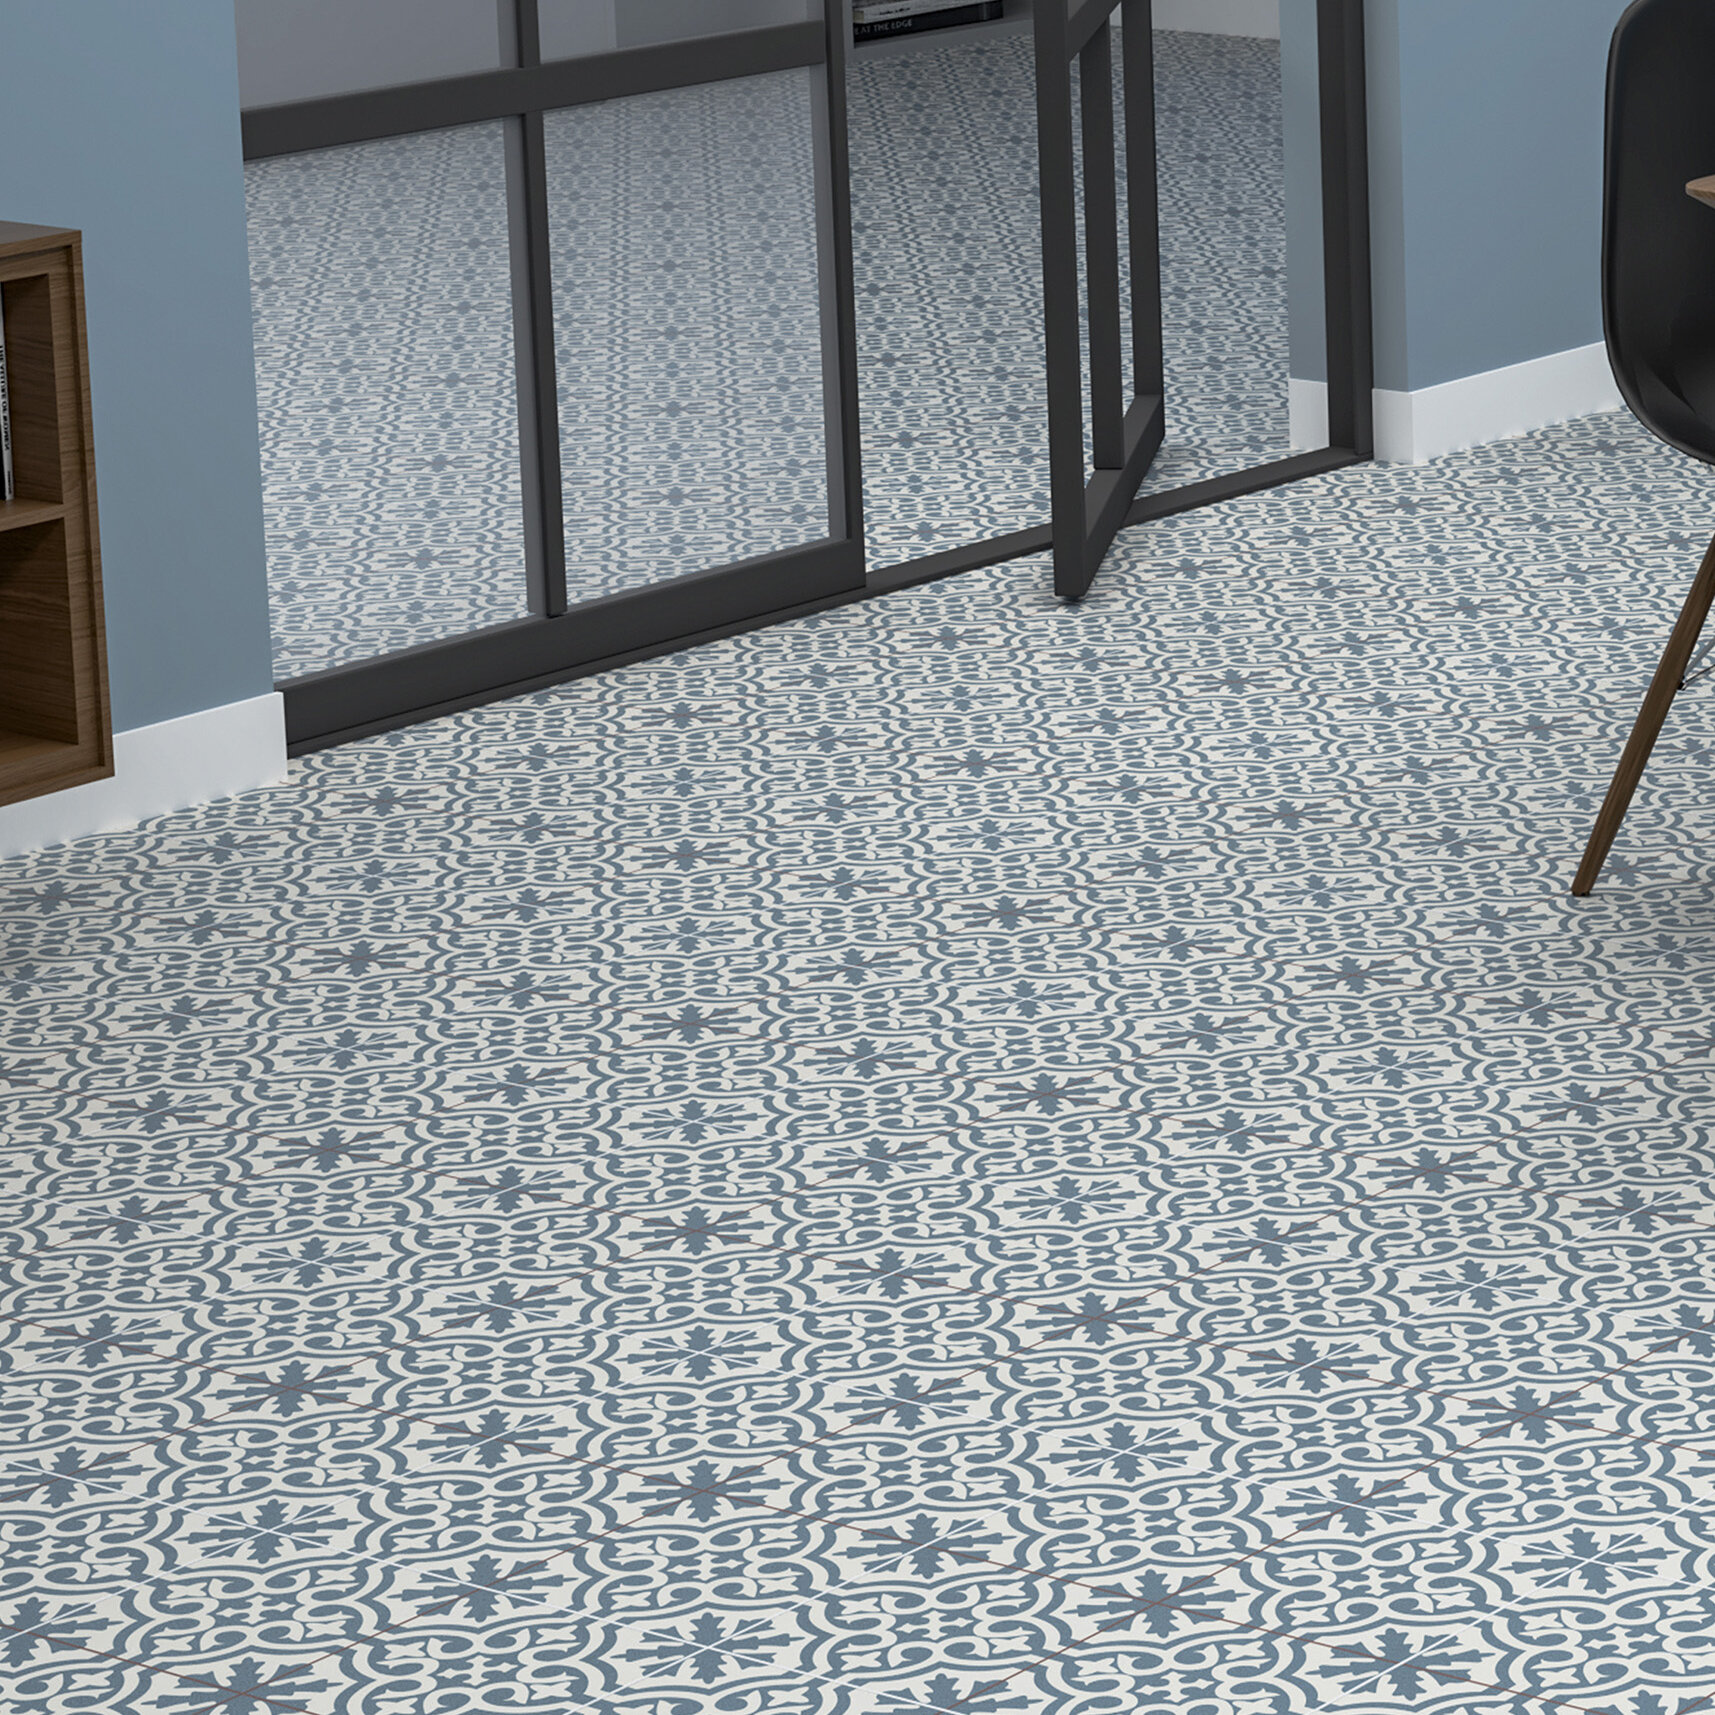 Ceramic Patterned Wall Floor Tile